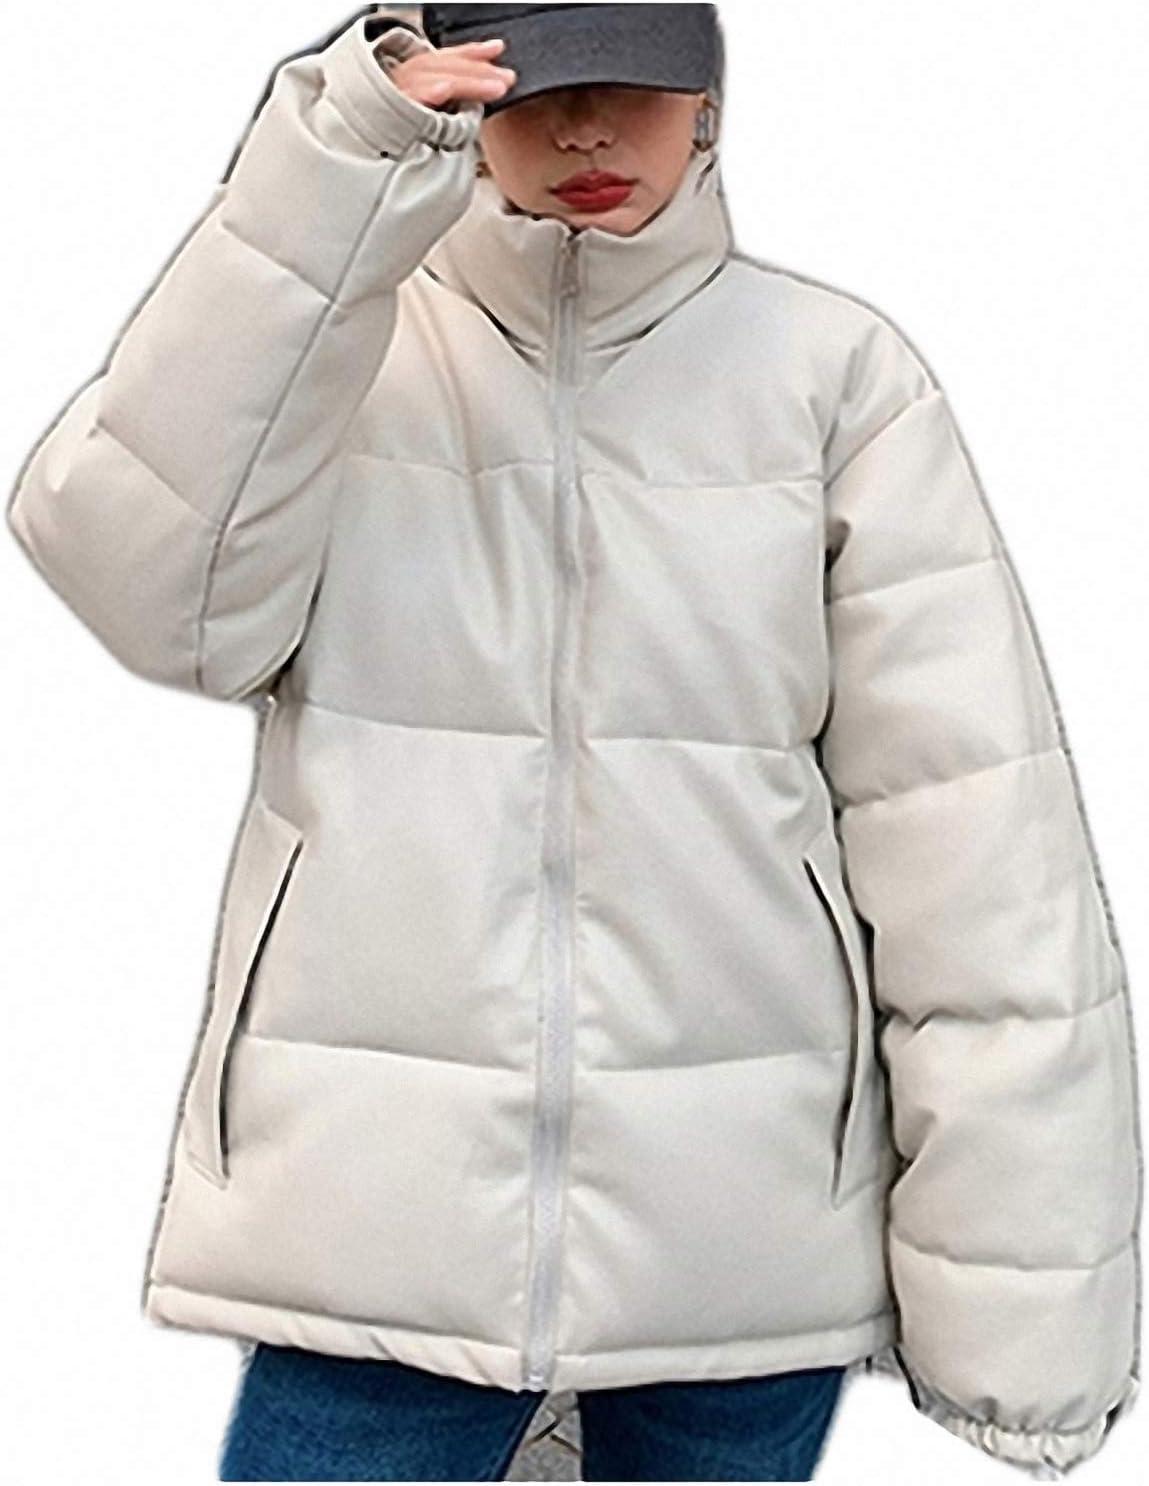 Autumn Winter Women Jackets Quilted Puffer Parkas Warm PU Leather Oversize Short Coat Beige S